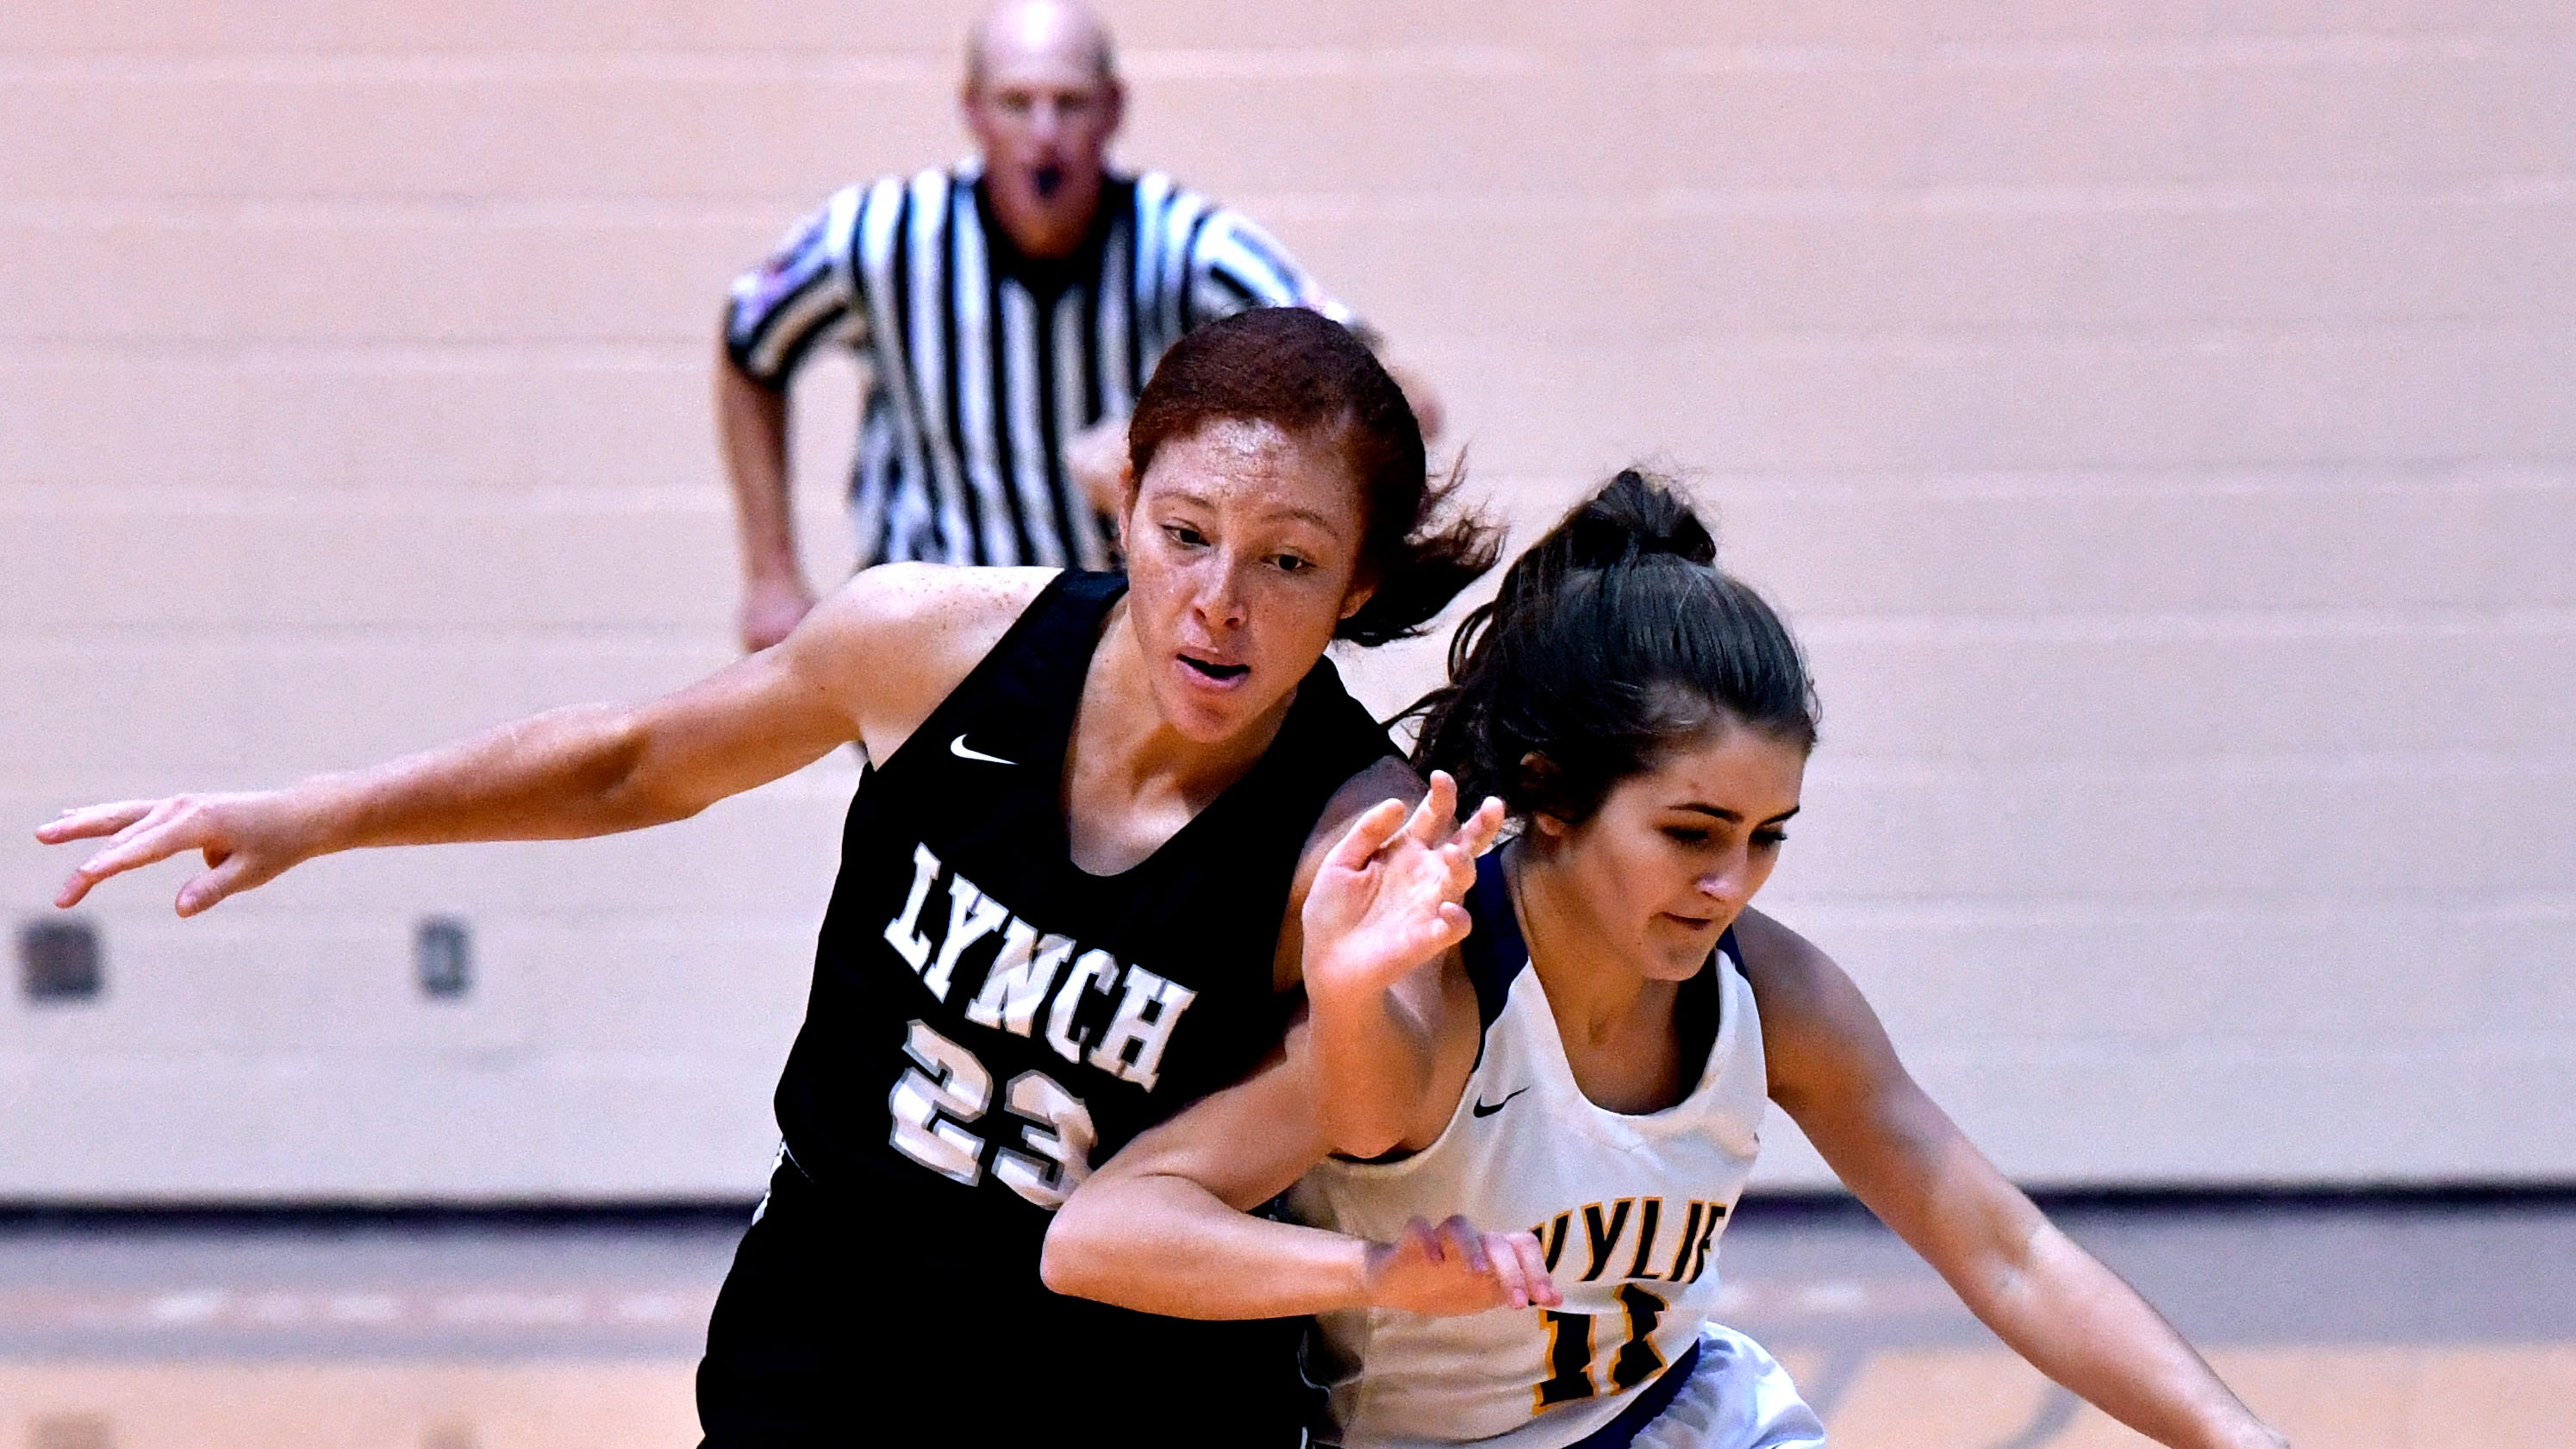 Wylie High School's Madi Latham fends off Bishop Lynch's Jaida Thomas during the final game of the Polk-Key City Basketball Classic at Hardin-Simmons University Saturday Nov. 17, 2018.